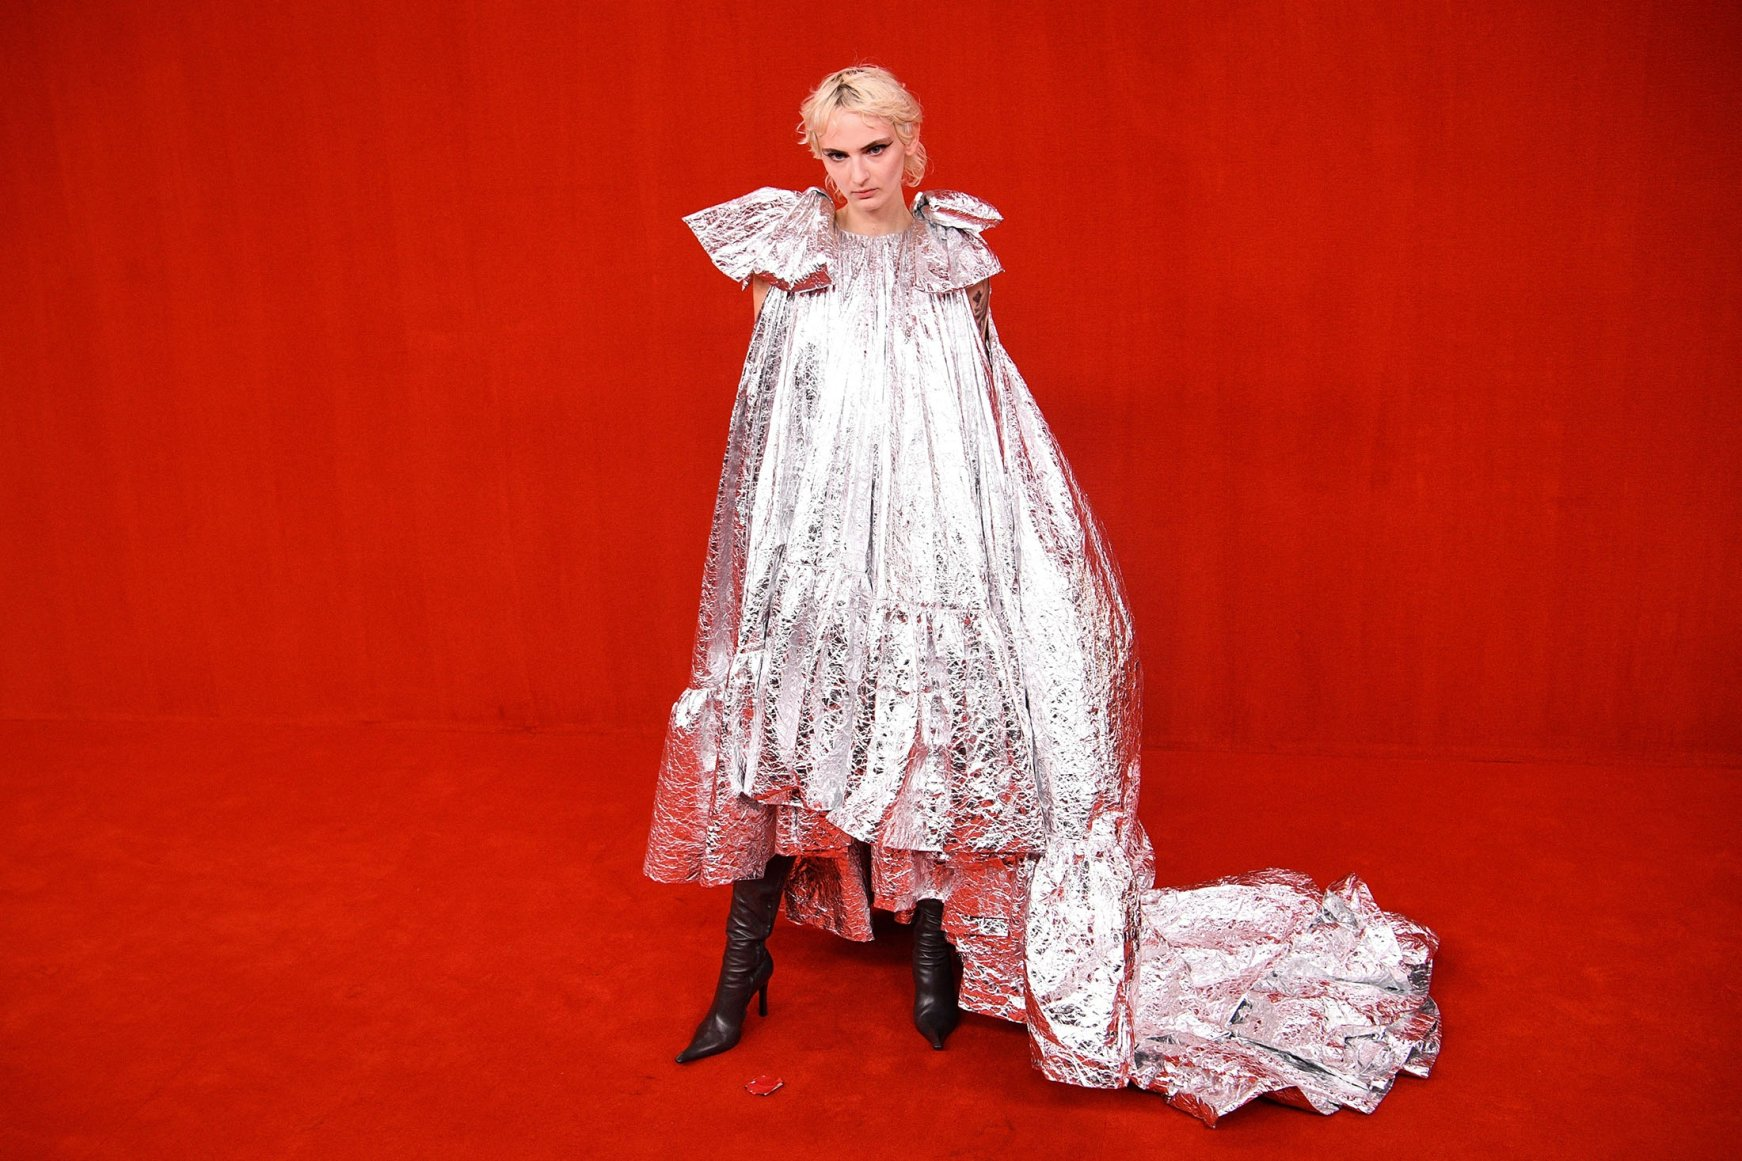 Paris Fashion Week 20 dazzles visitors with glamor   Daily Sabah